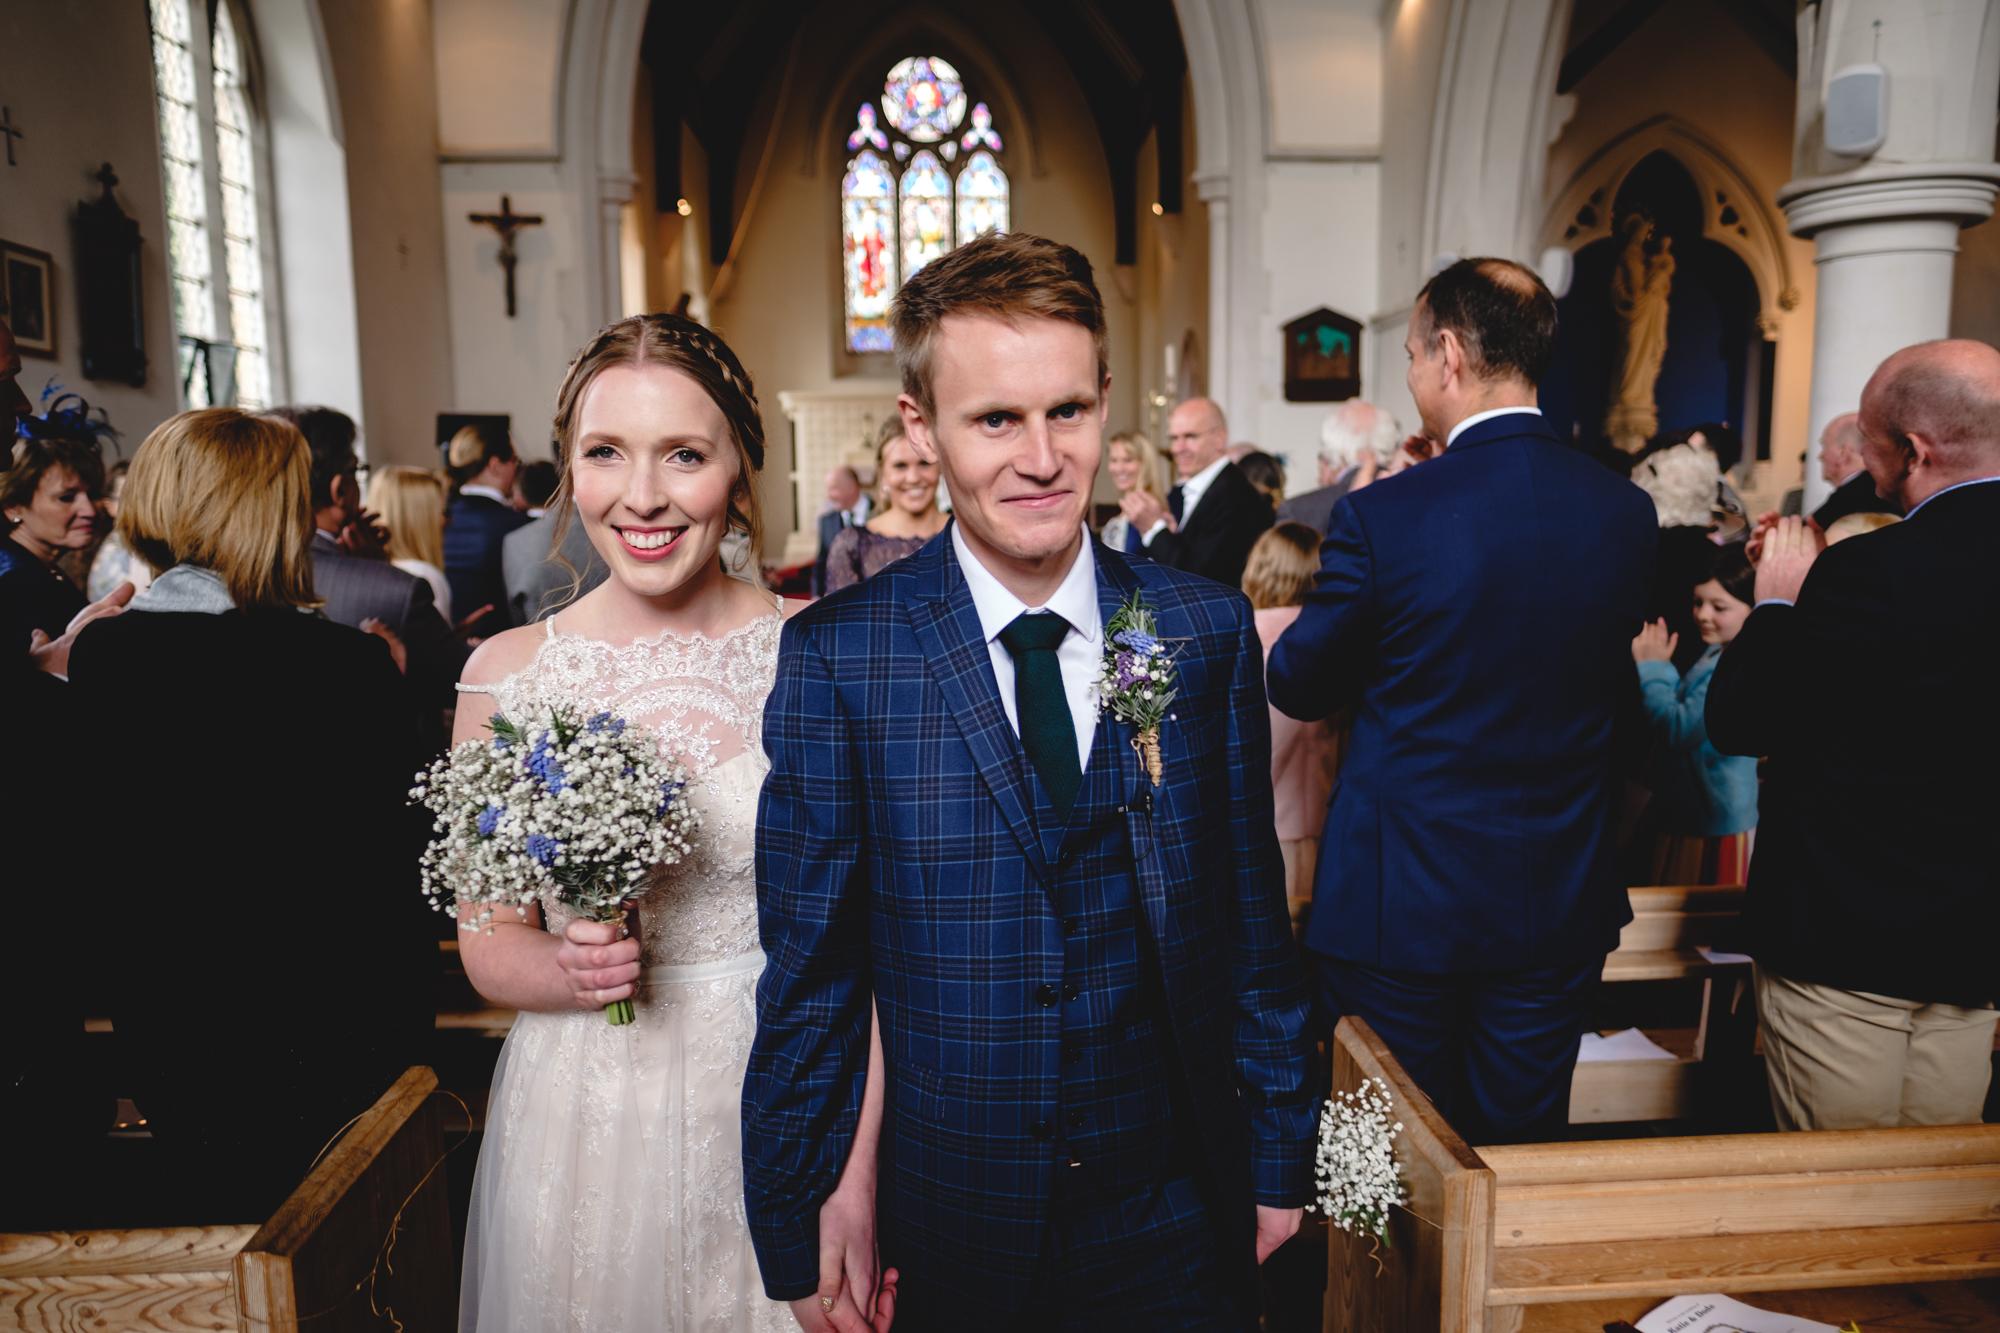 Katie and Dode weddings (84 of 207).jpg